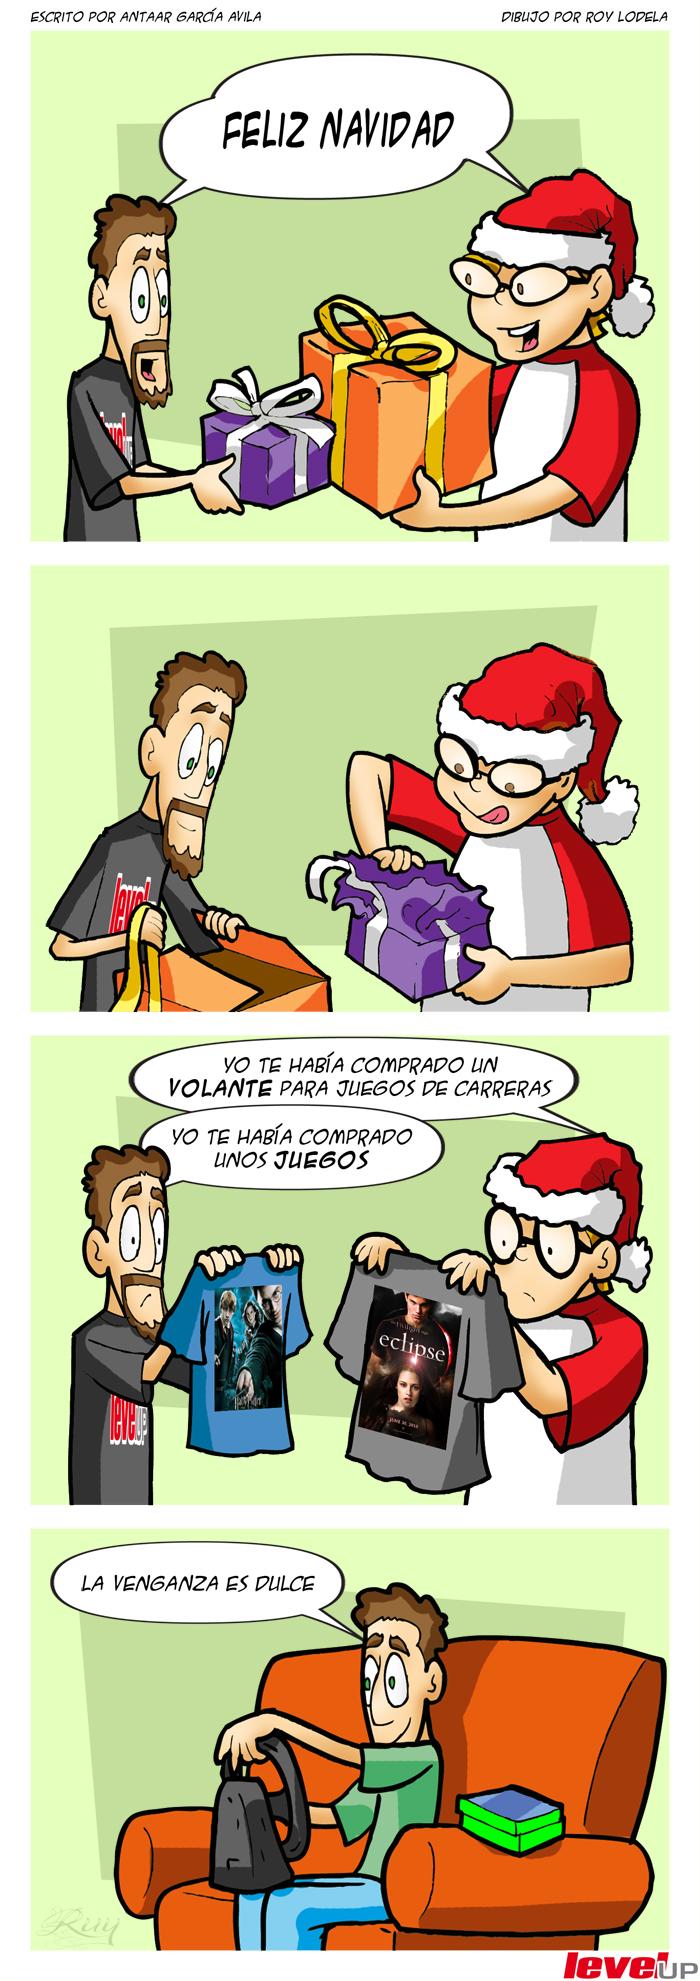 Navidad: La venganza